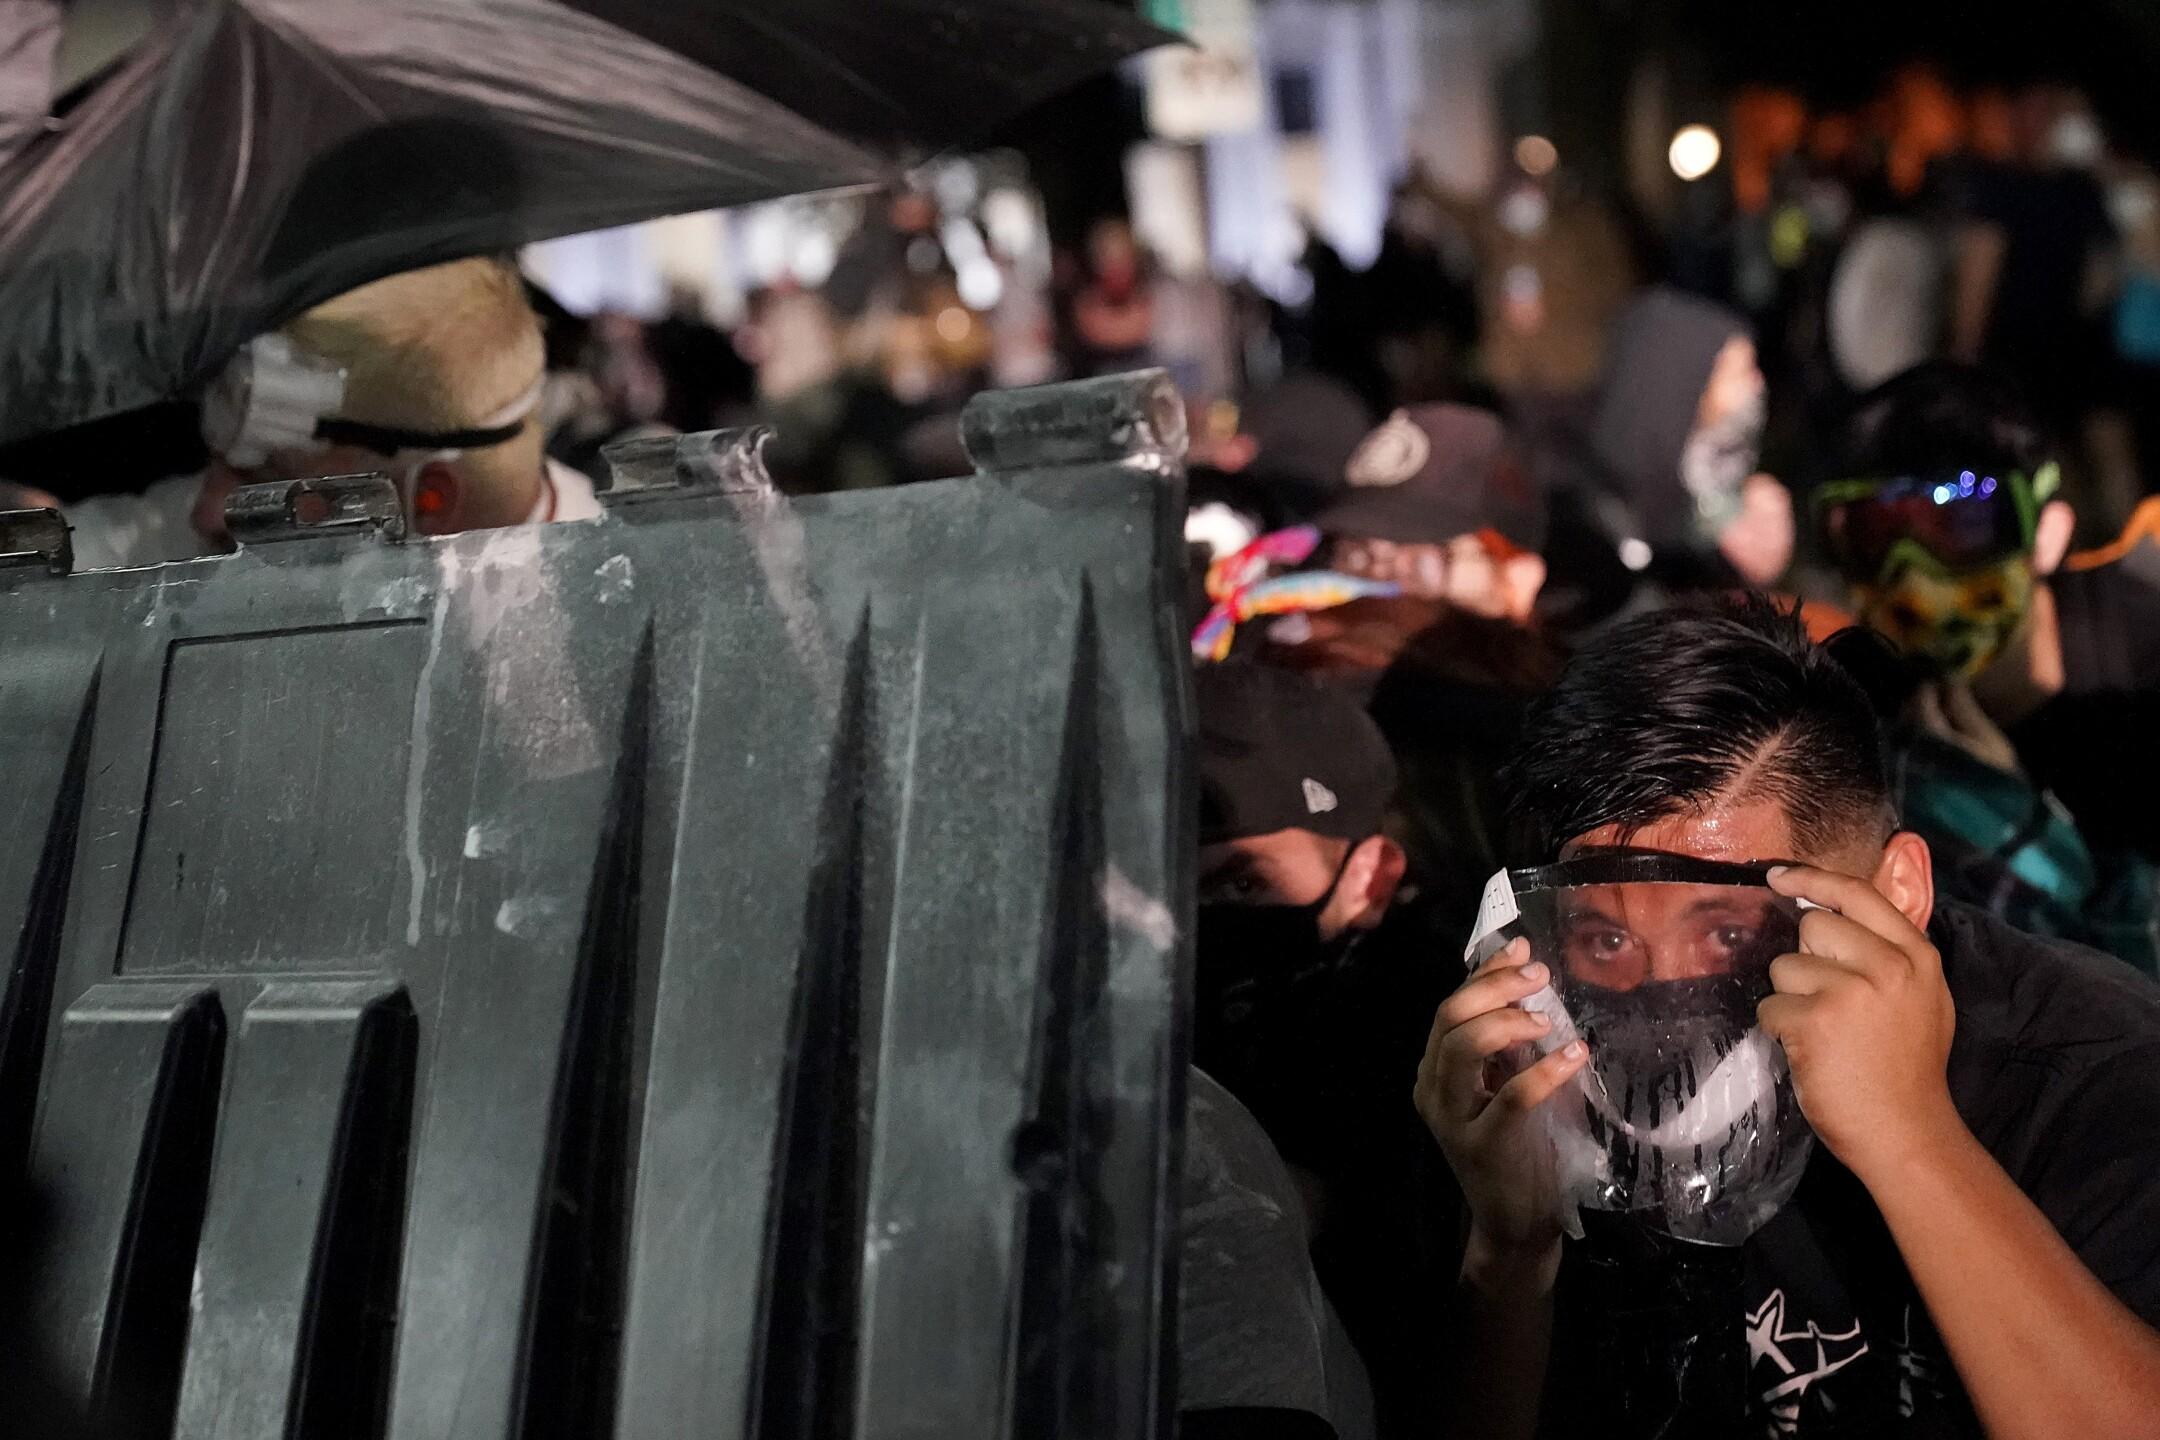 kenosha unrest